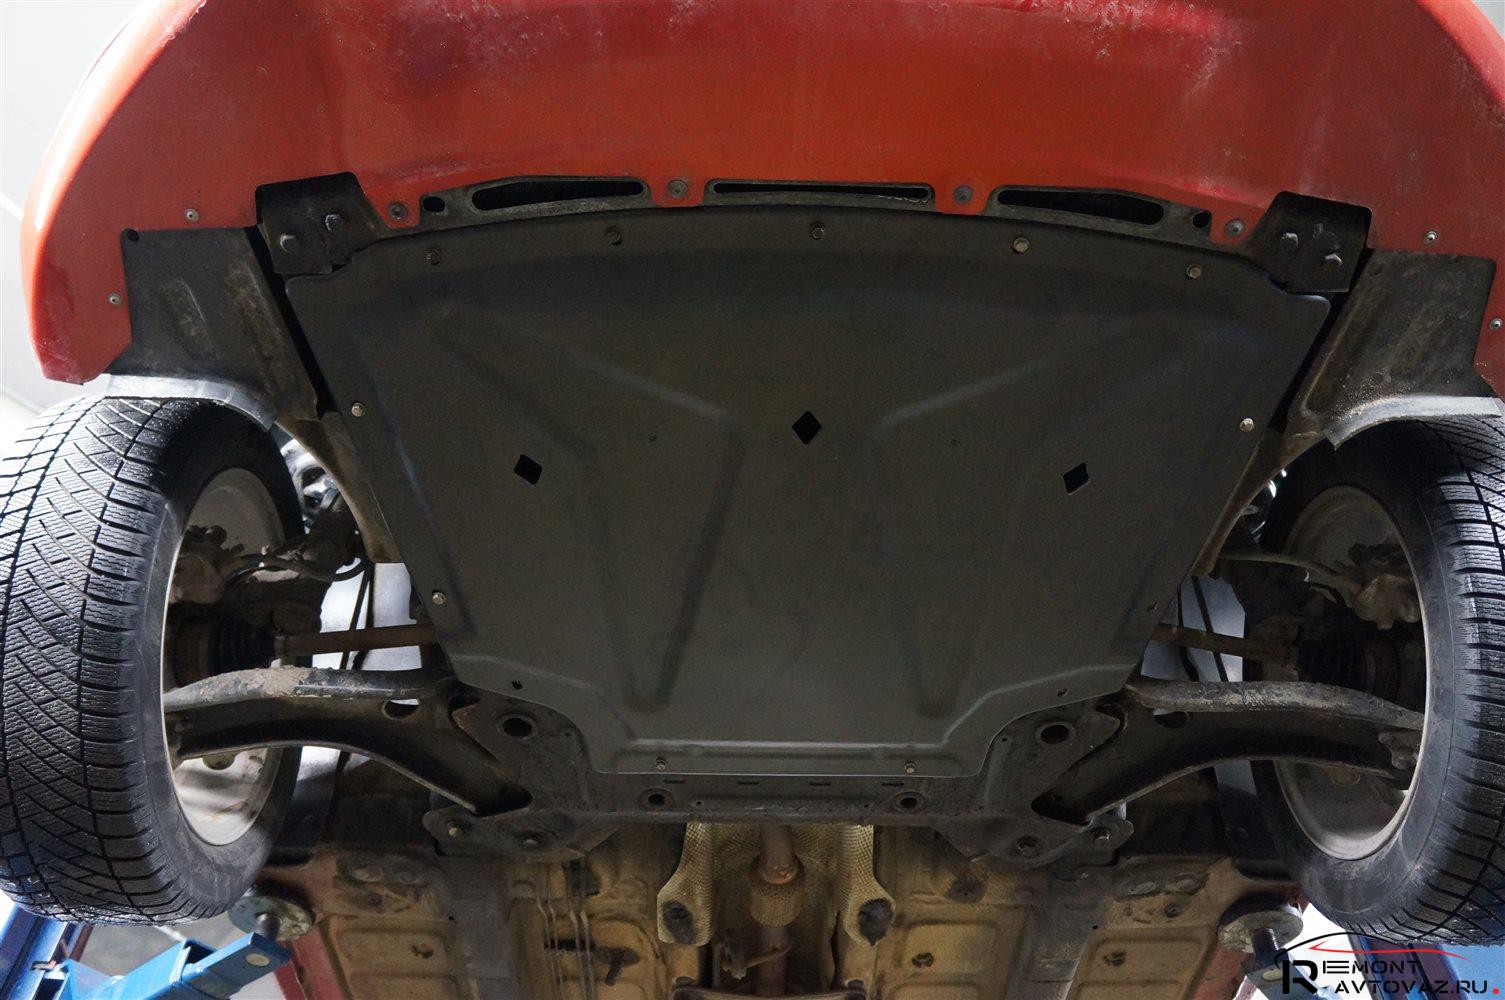 Лада Веста защита двигателя: 6 материалов изготовления